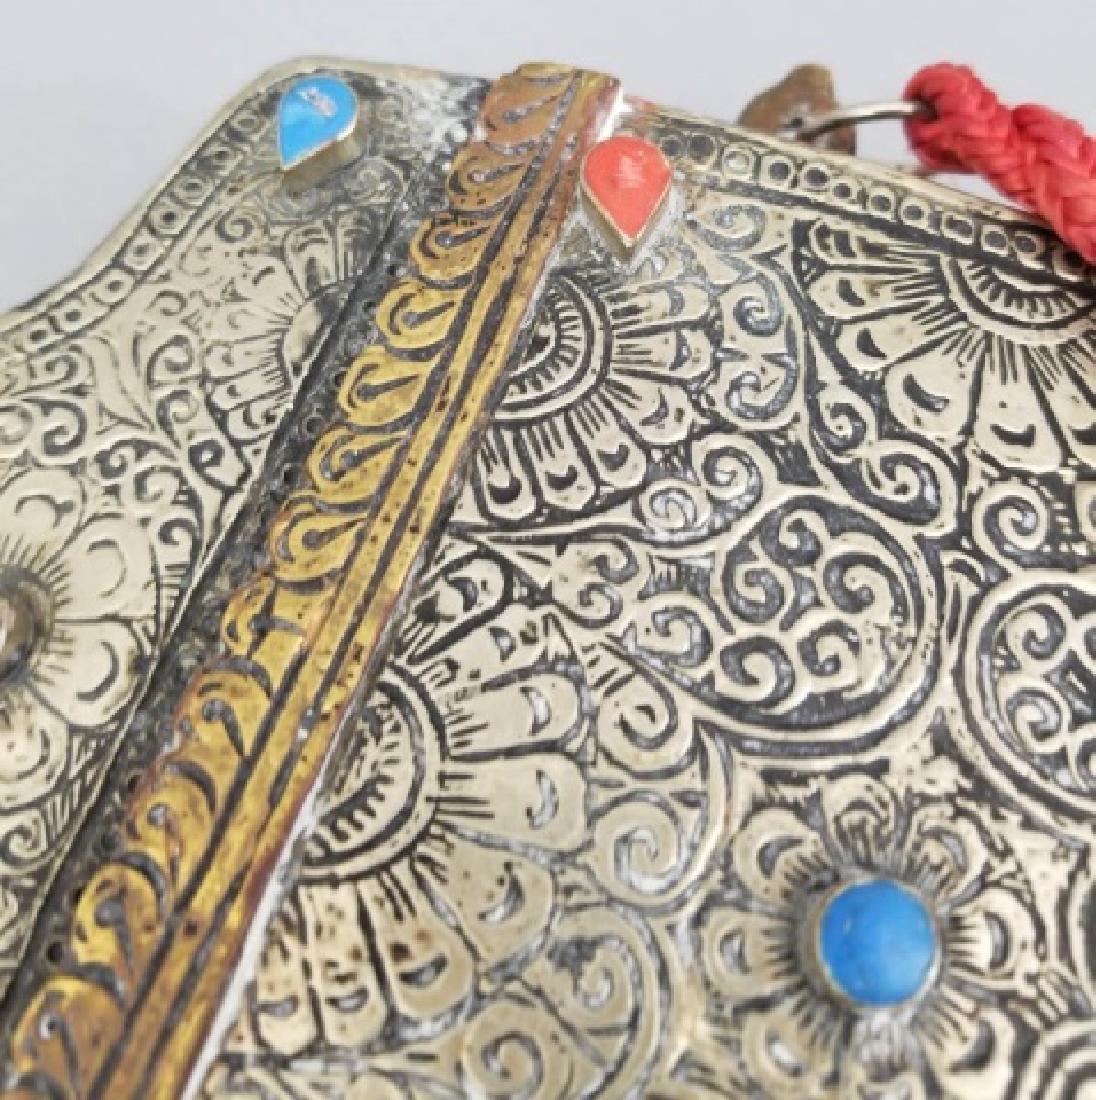 2 Silver & Brass Moroccan Items - Purse & Canteen - 6